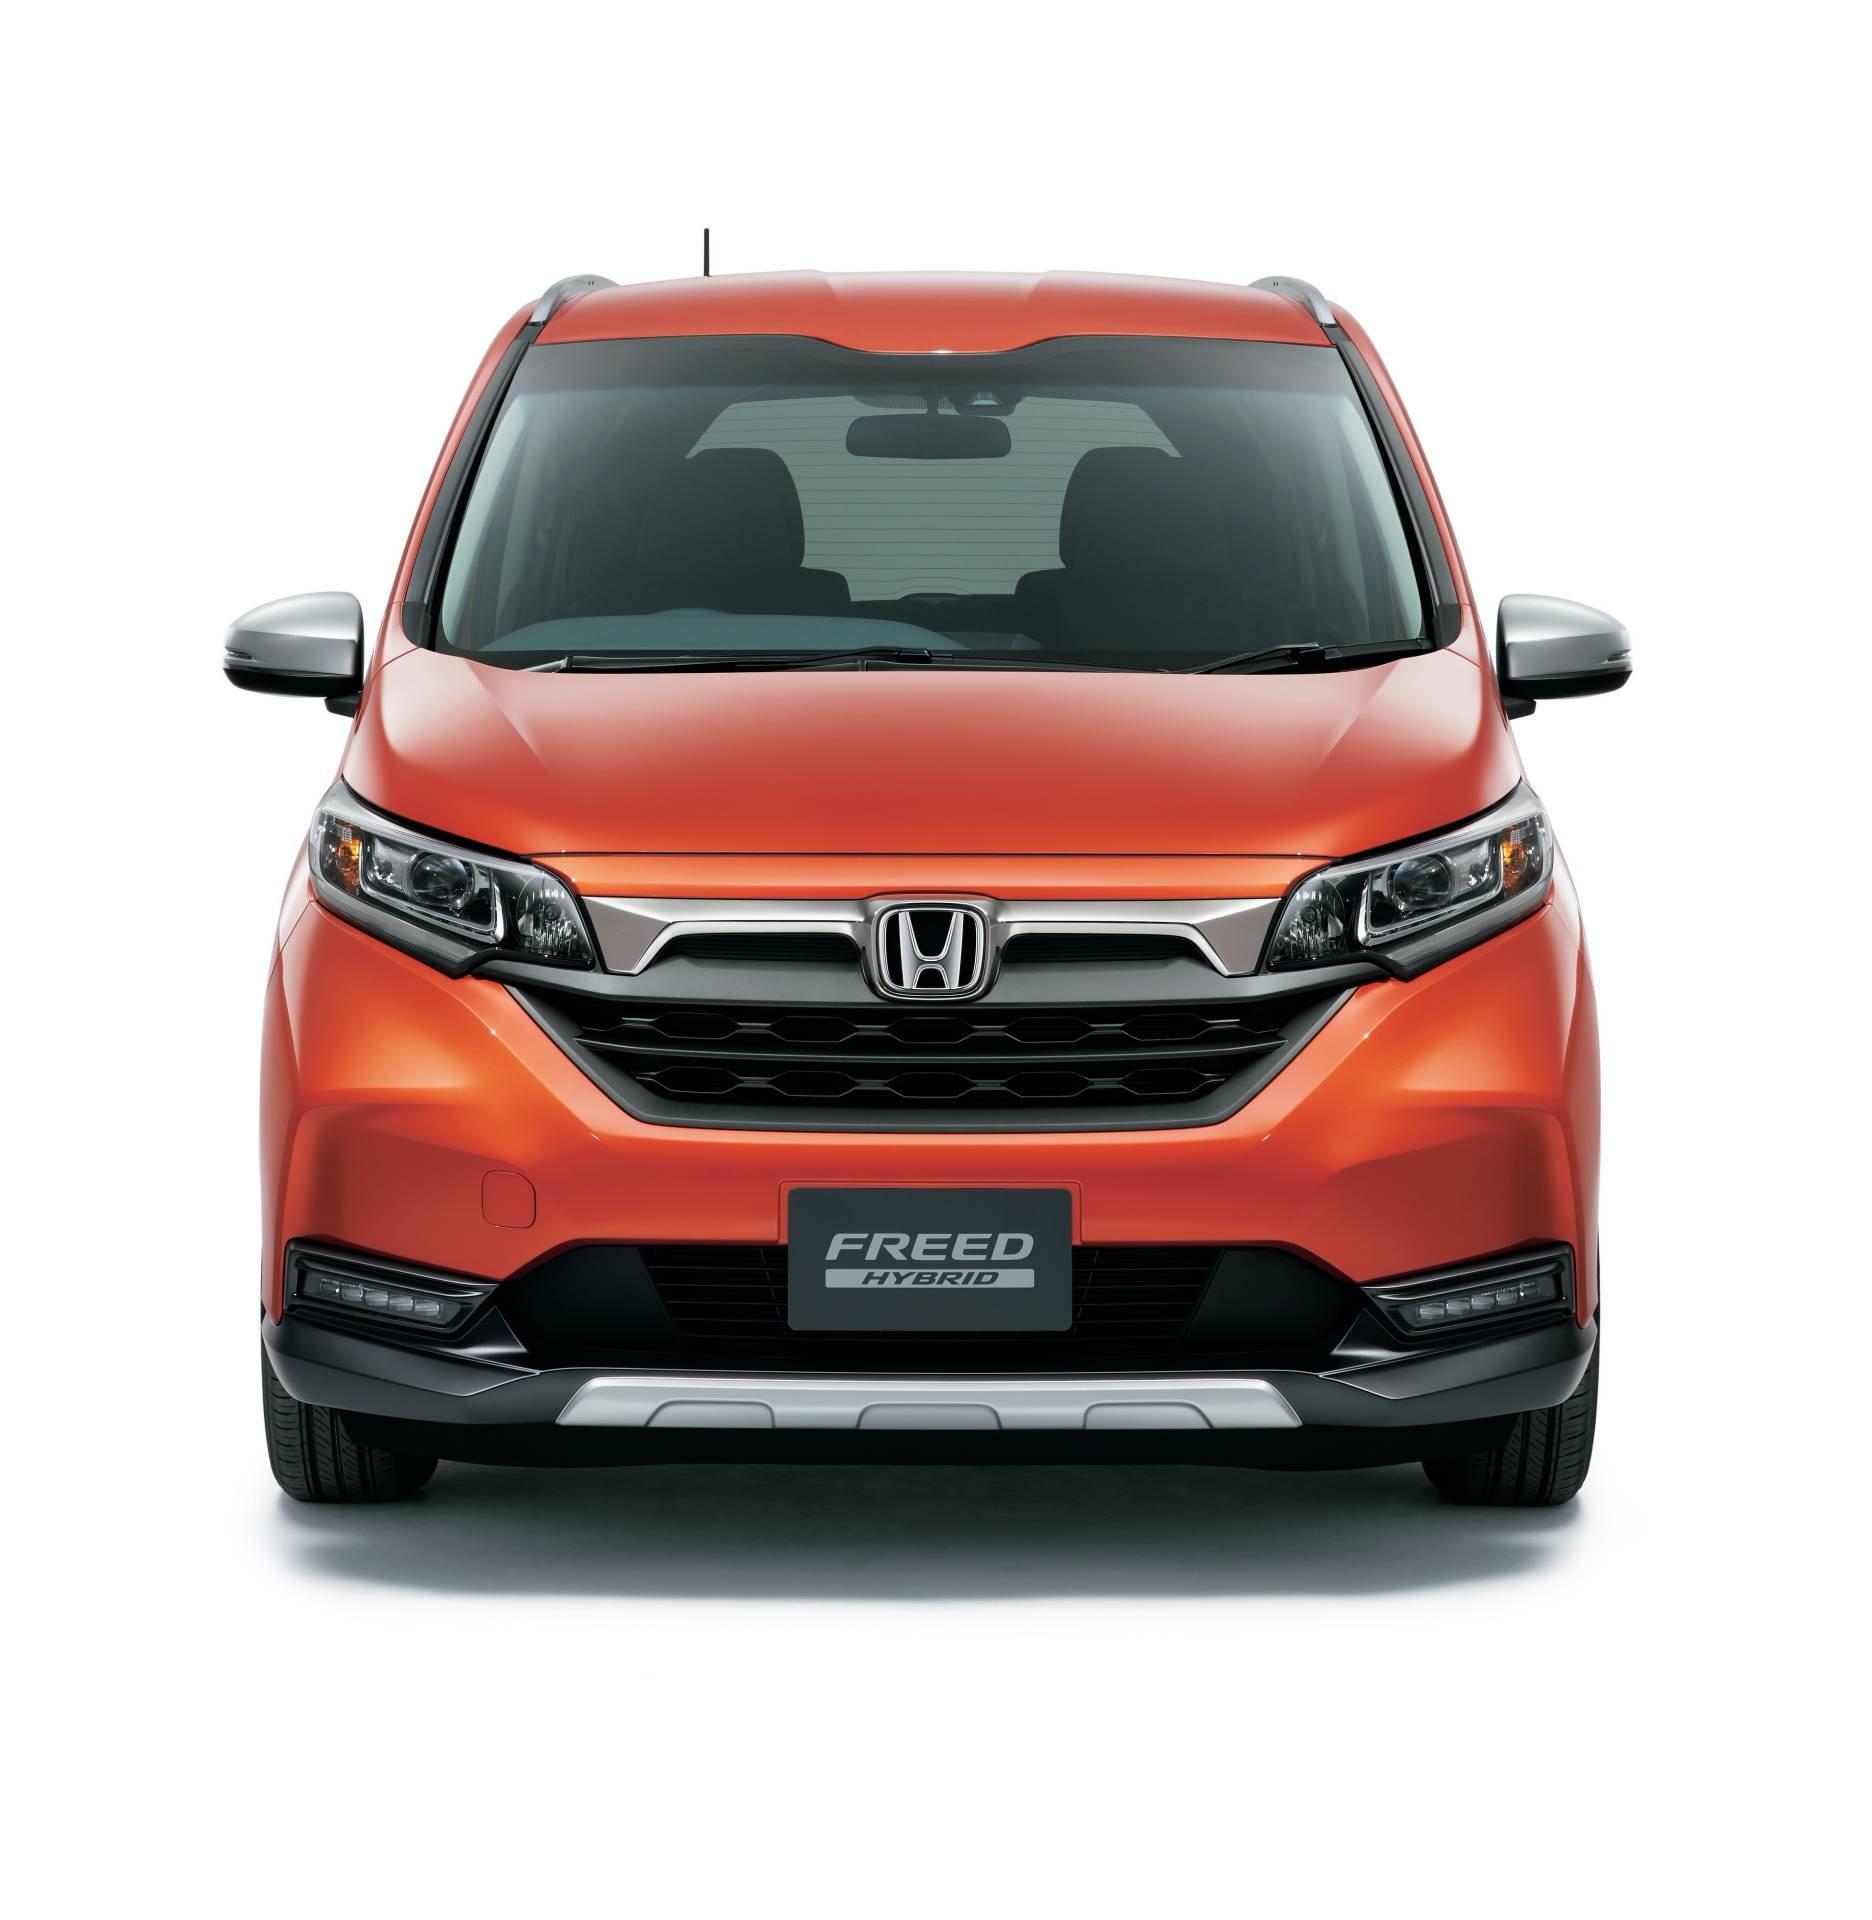 Honda-Freed-2020-4